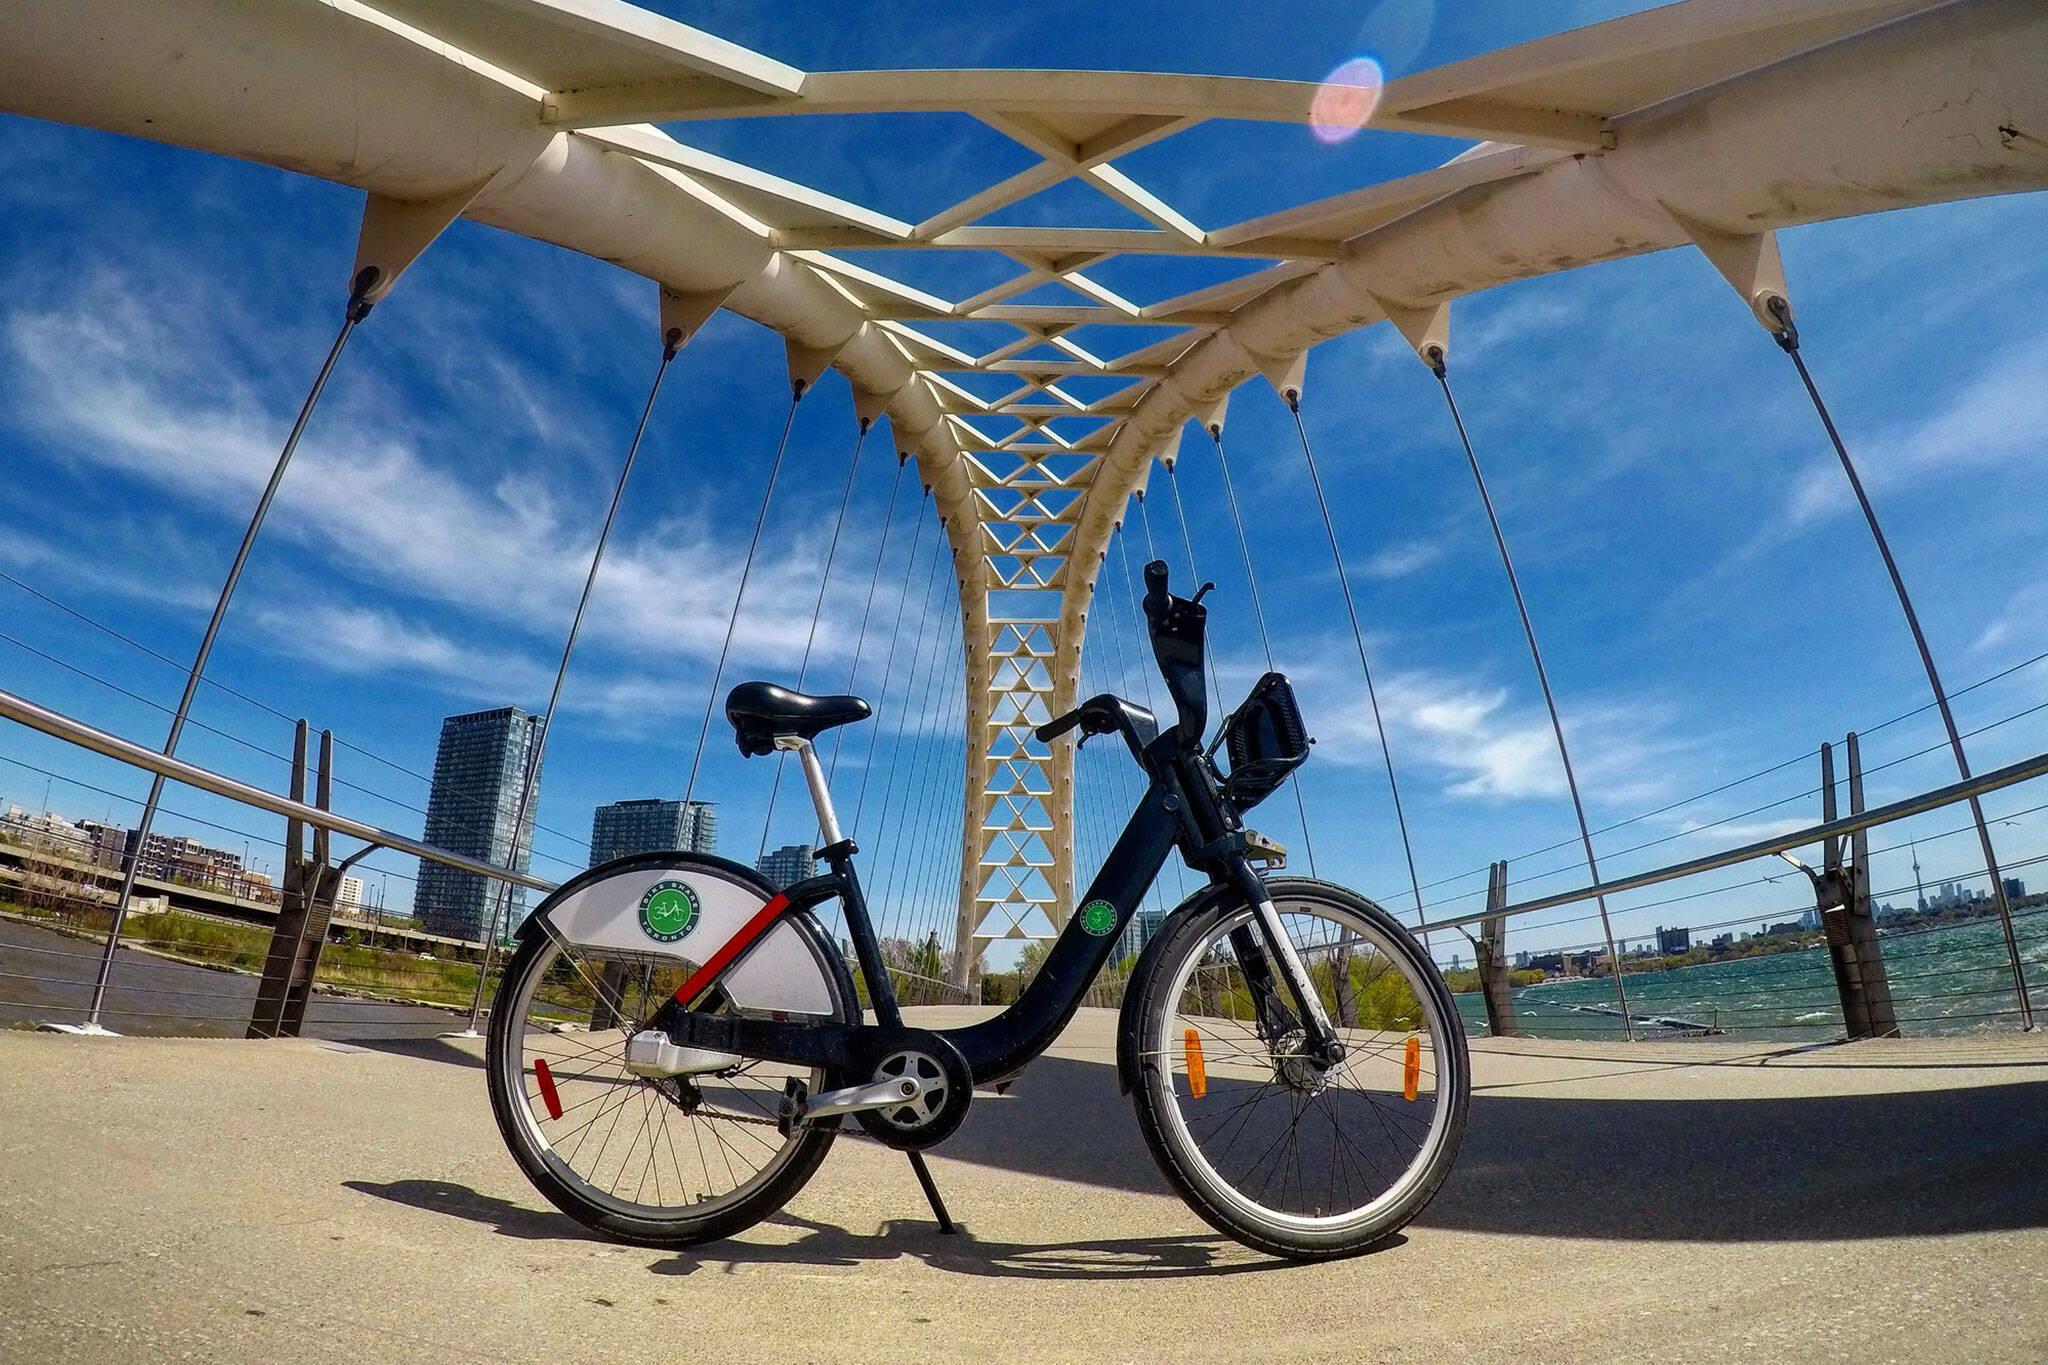 june bike share toronto free